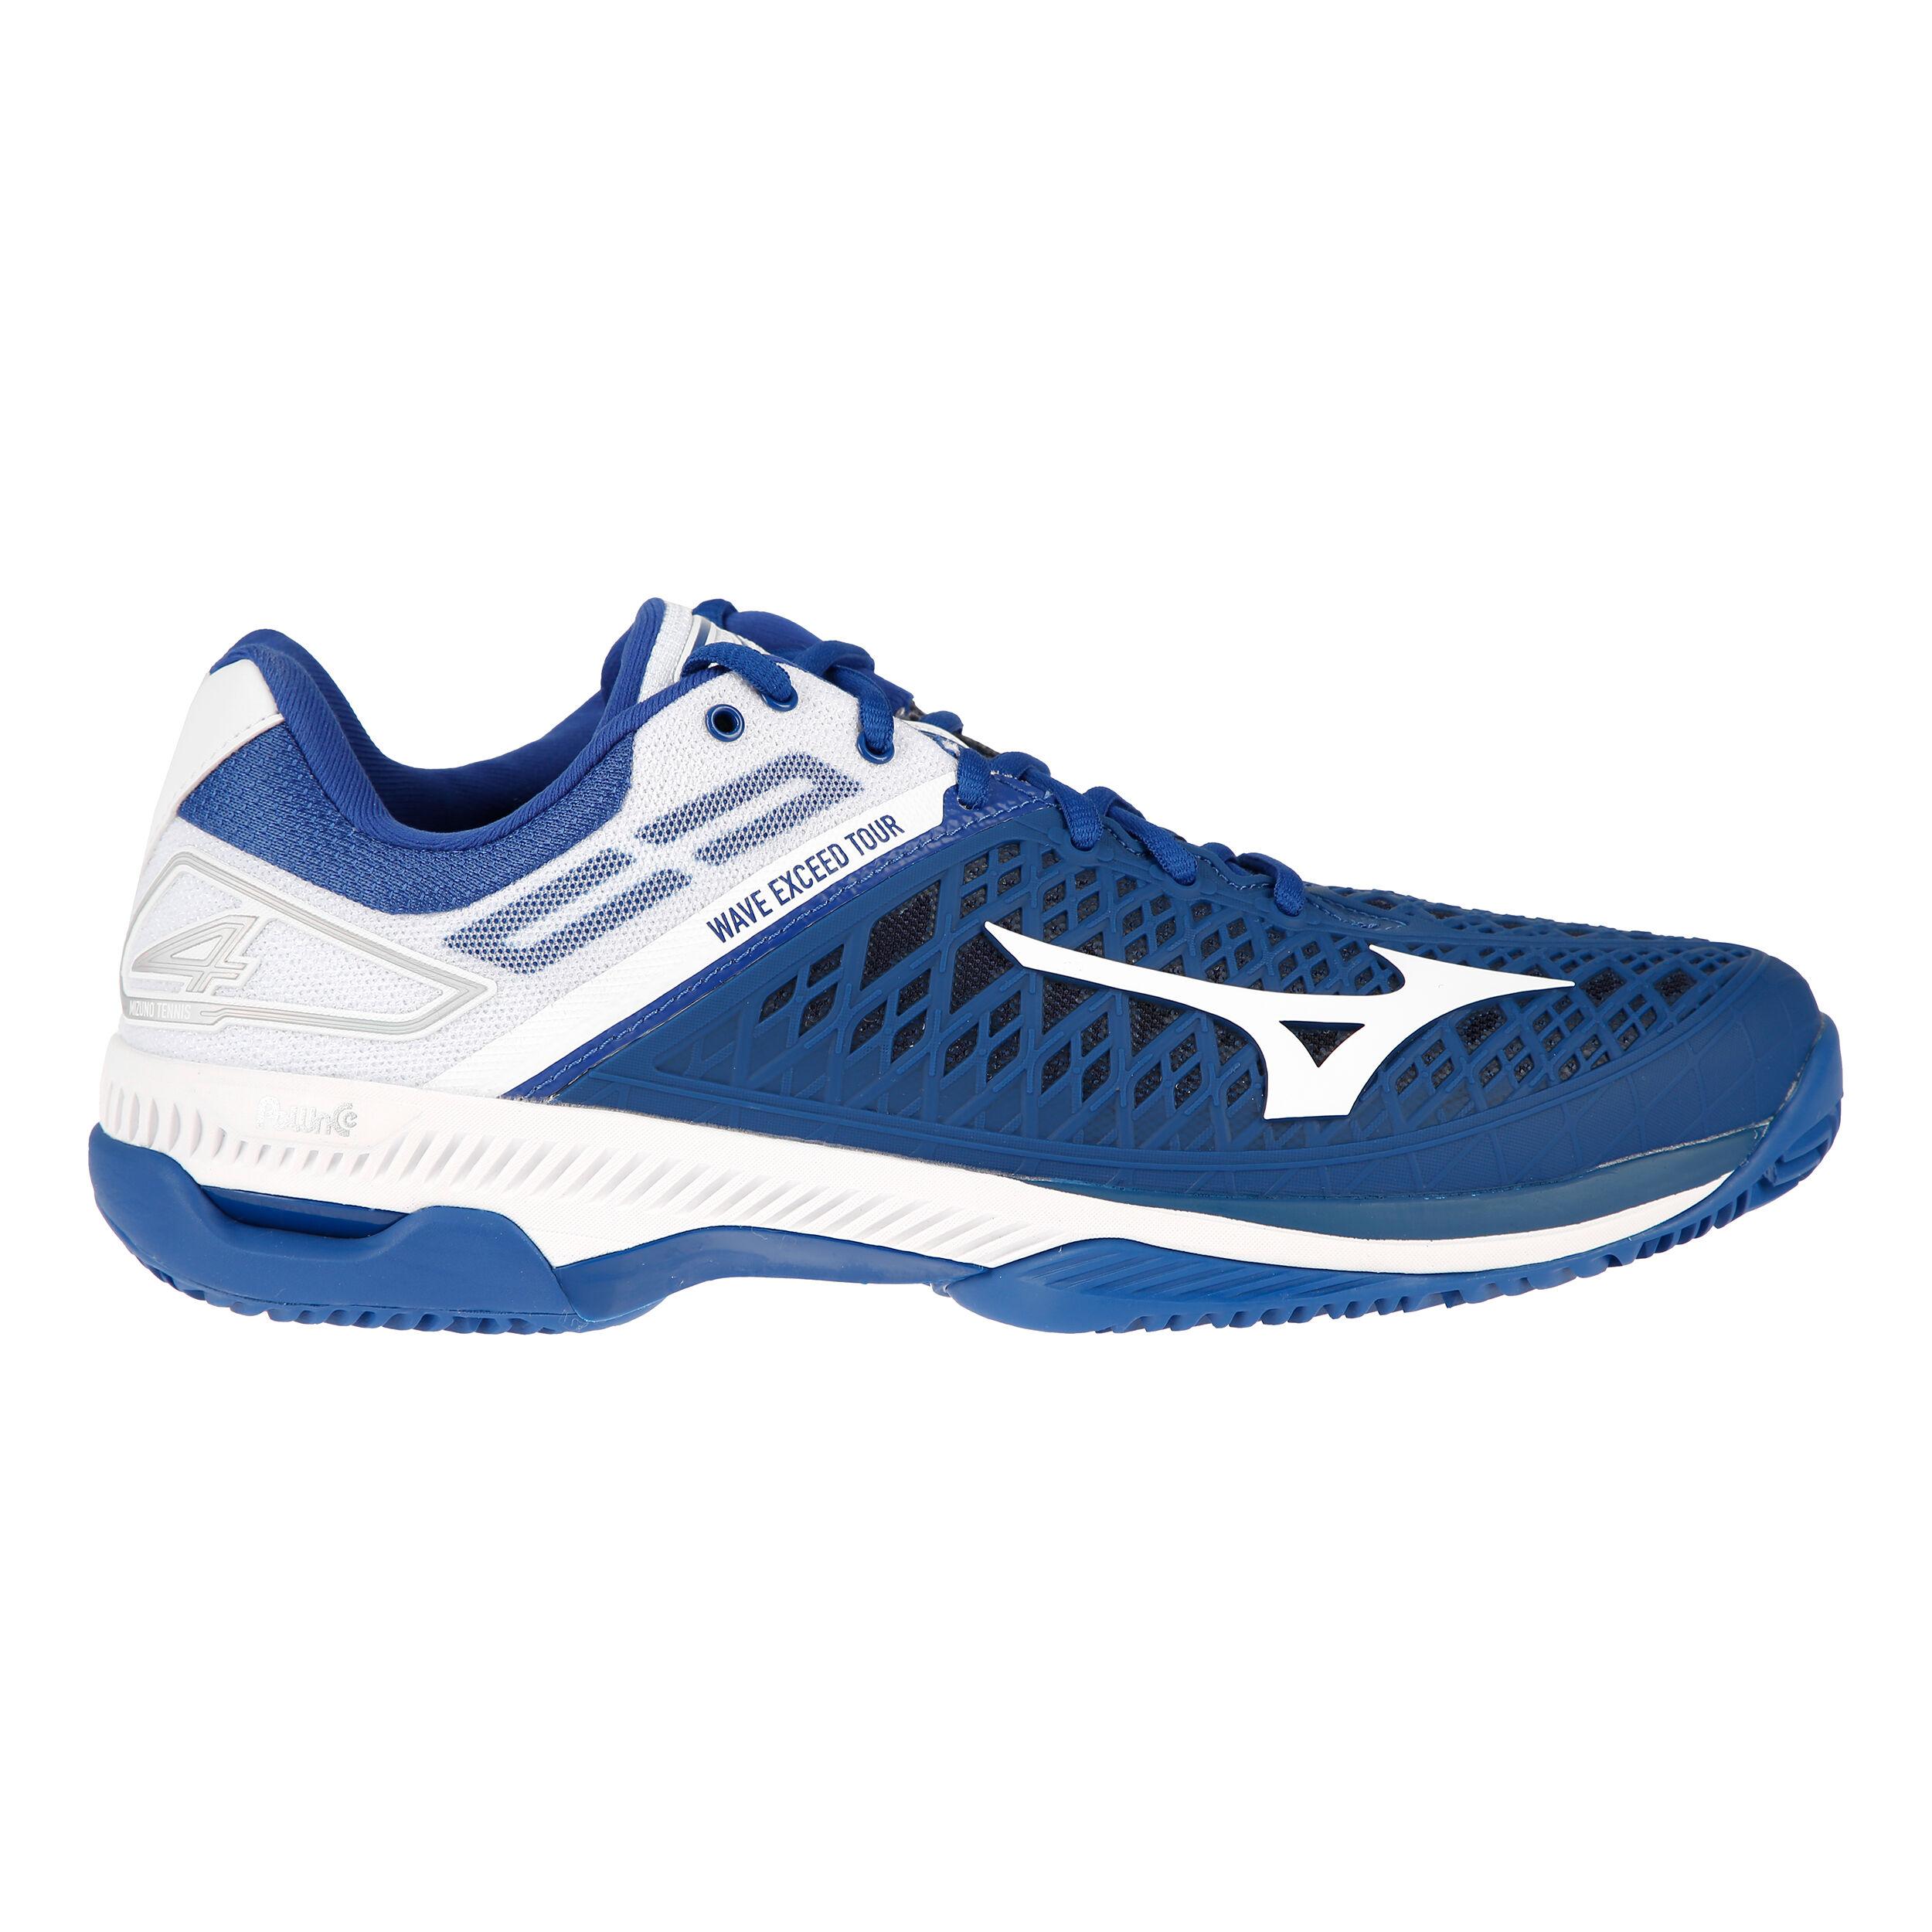 Mizuno Wave Exceed Tour 4 Clay Chaussure Terre Battue Hommes Bleu , Blanc